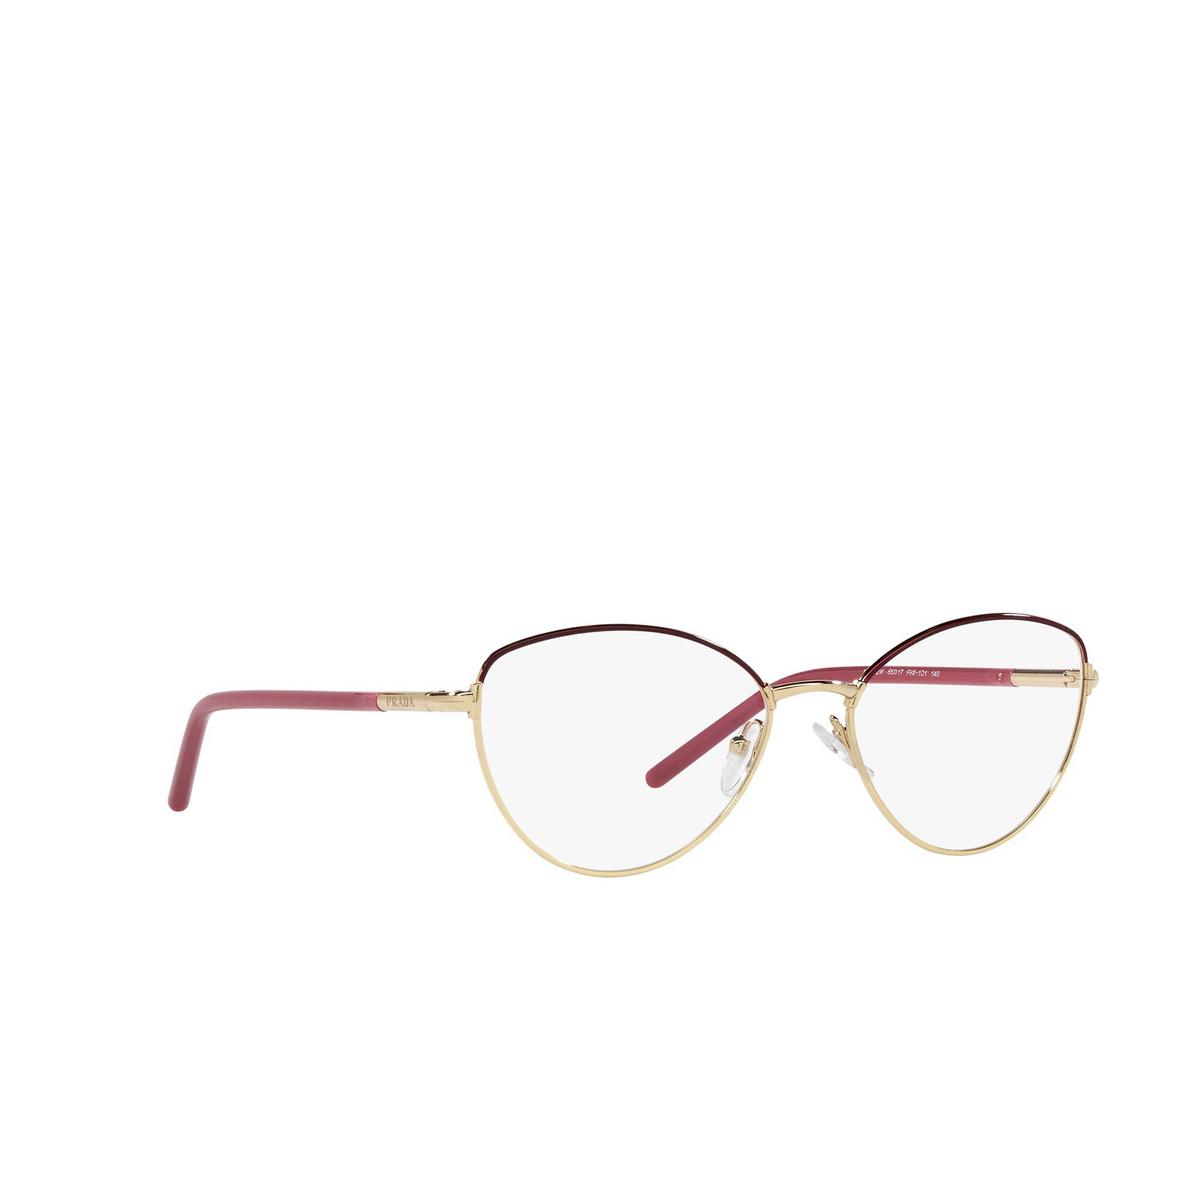 Prada® Butterfly Eyeglasses: PR 62WV color Bordeaux / Gold FHX1O1 - three-quarters view.